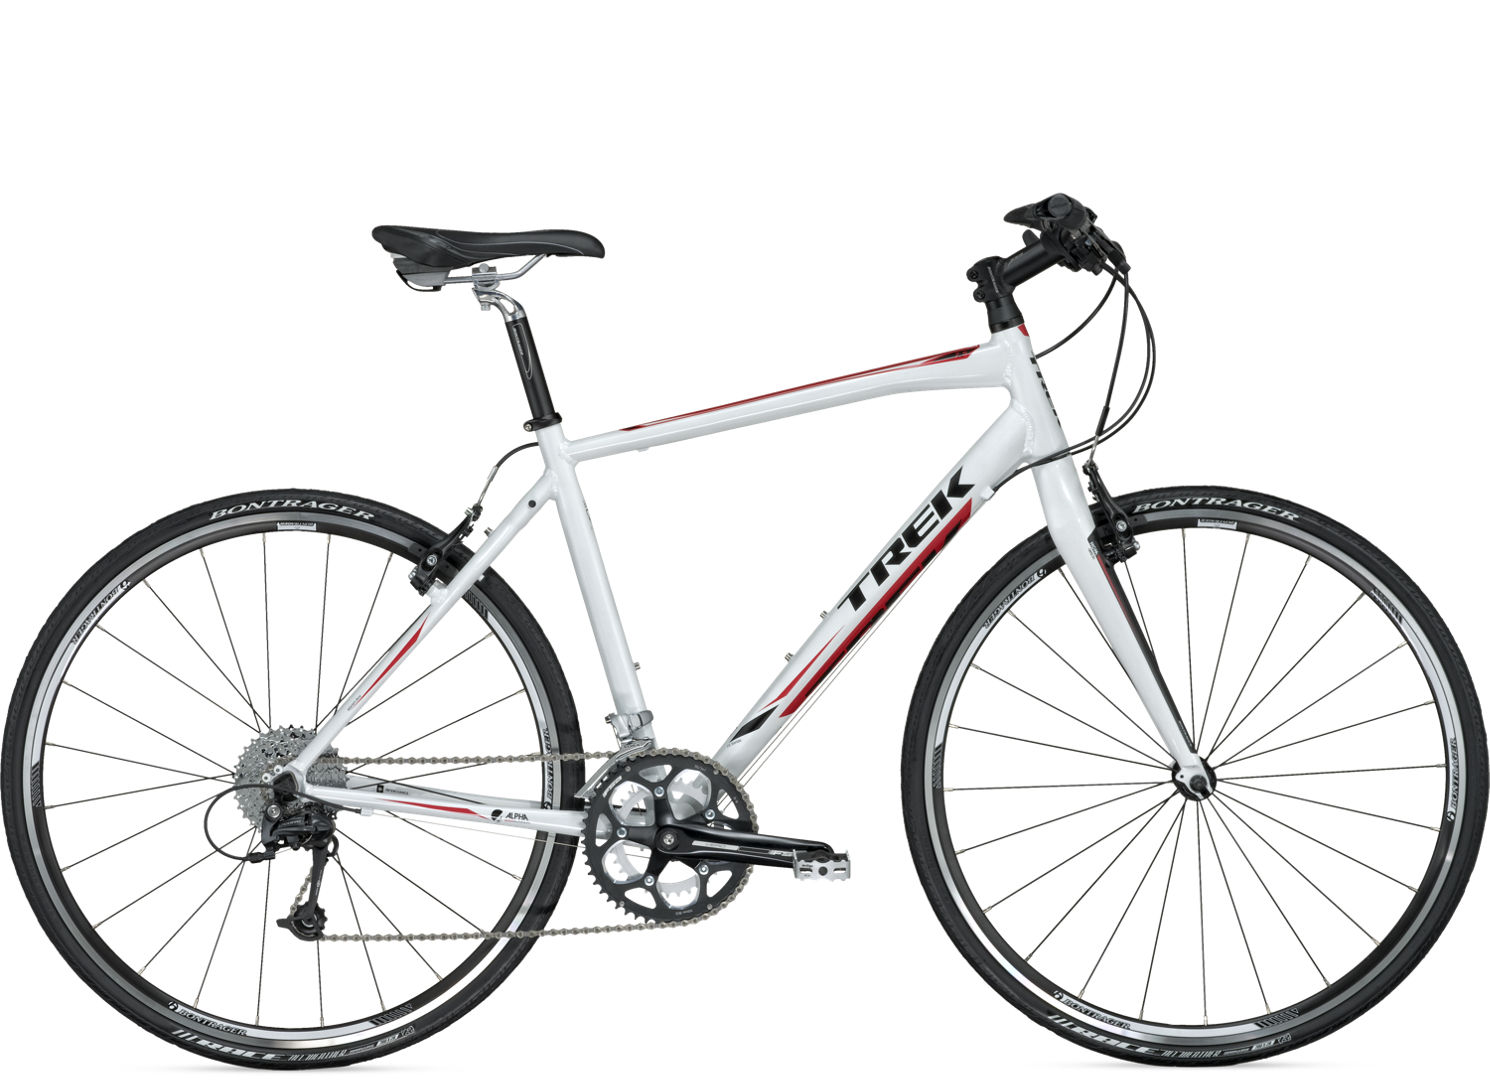 Need feedback / advise on choosing Trek fitness bike, to